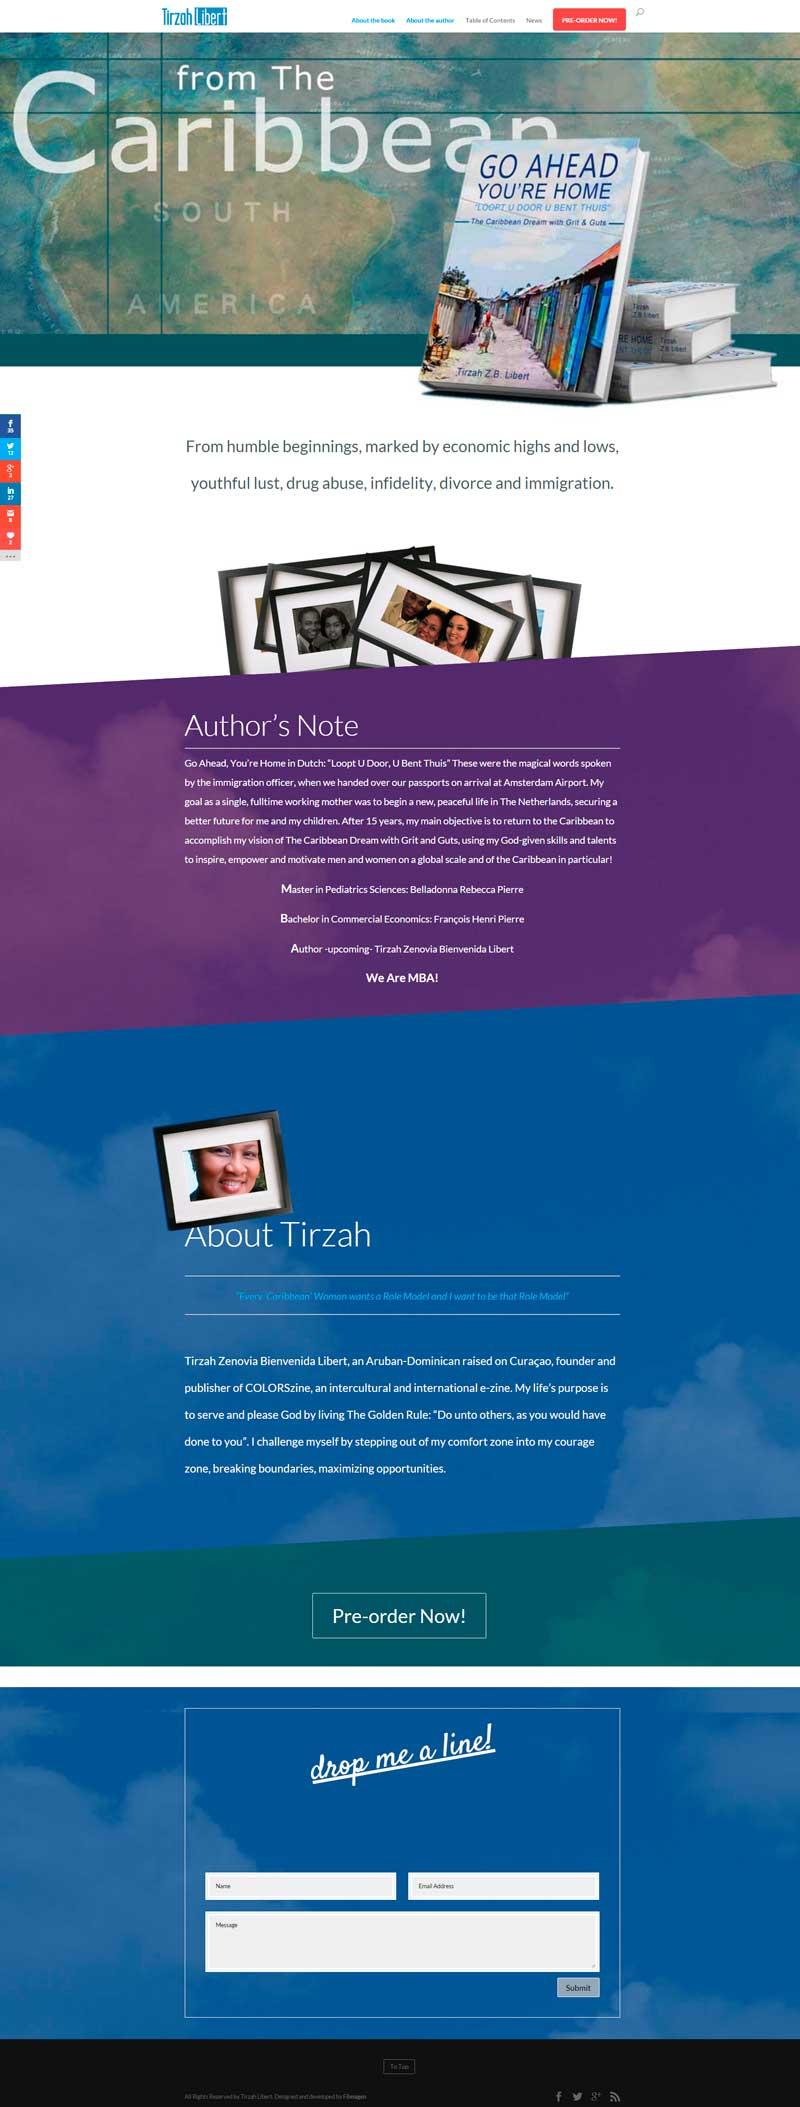 sitio web Tirzah Libert